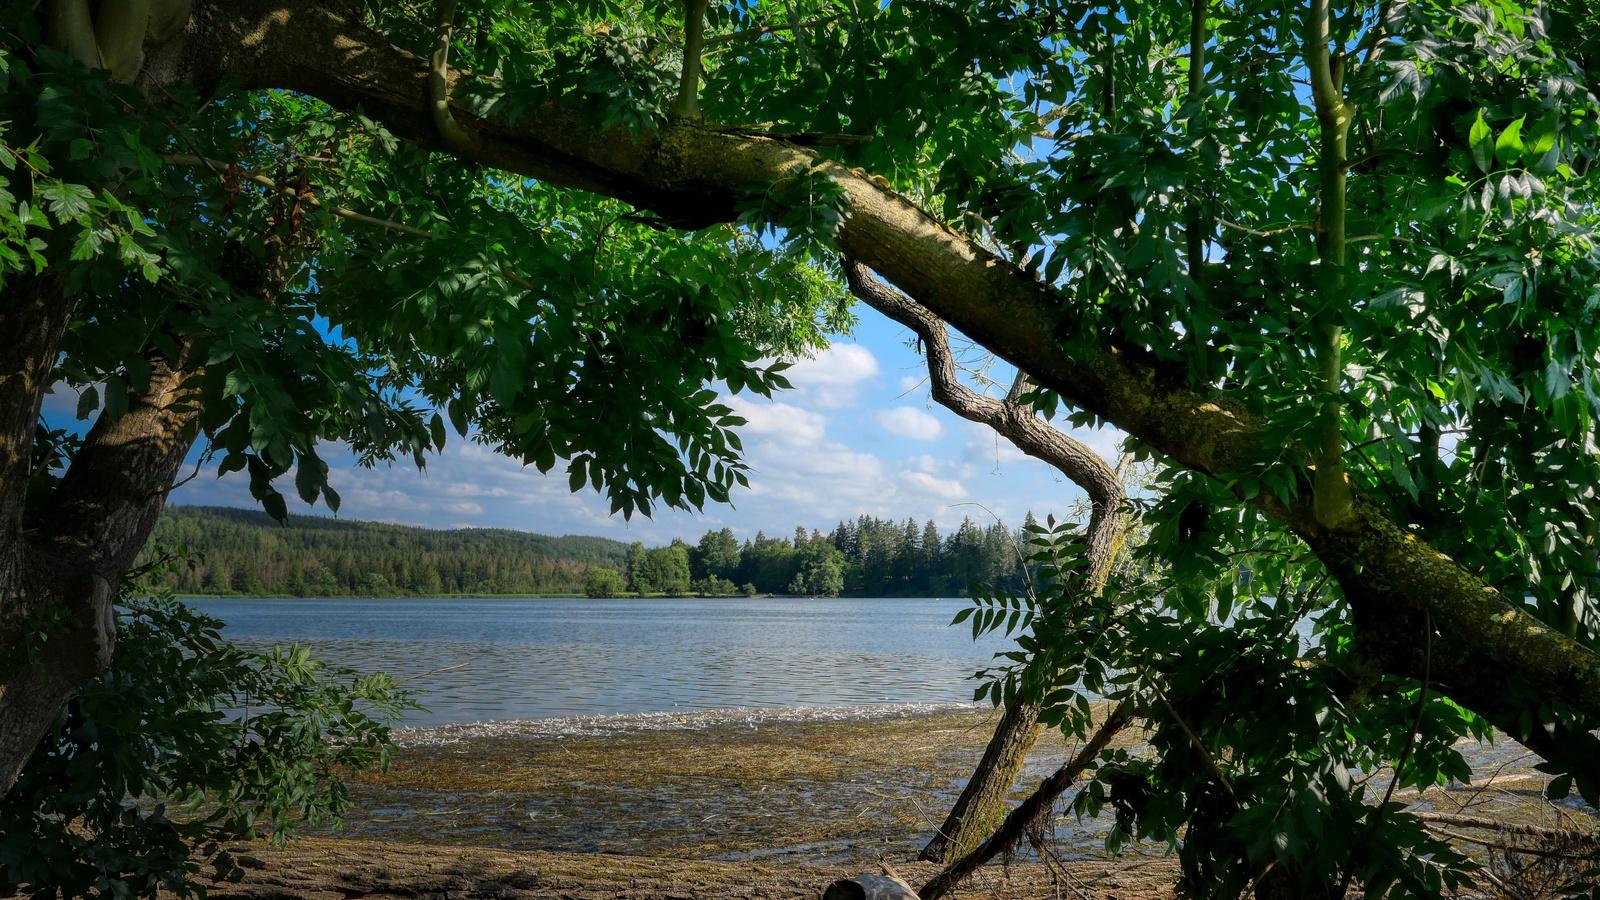 небо, река, берег, деревья